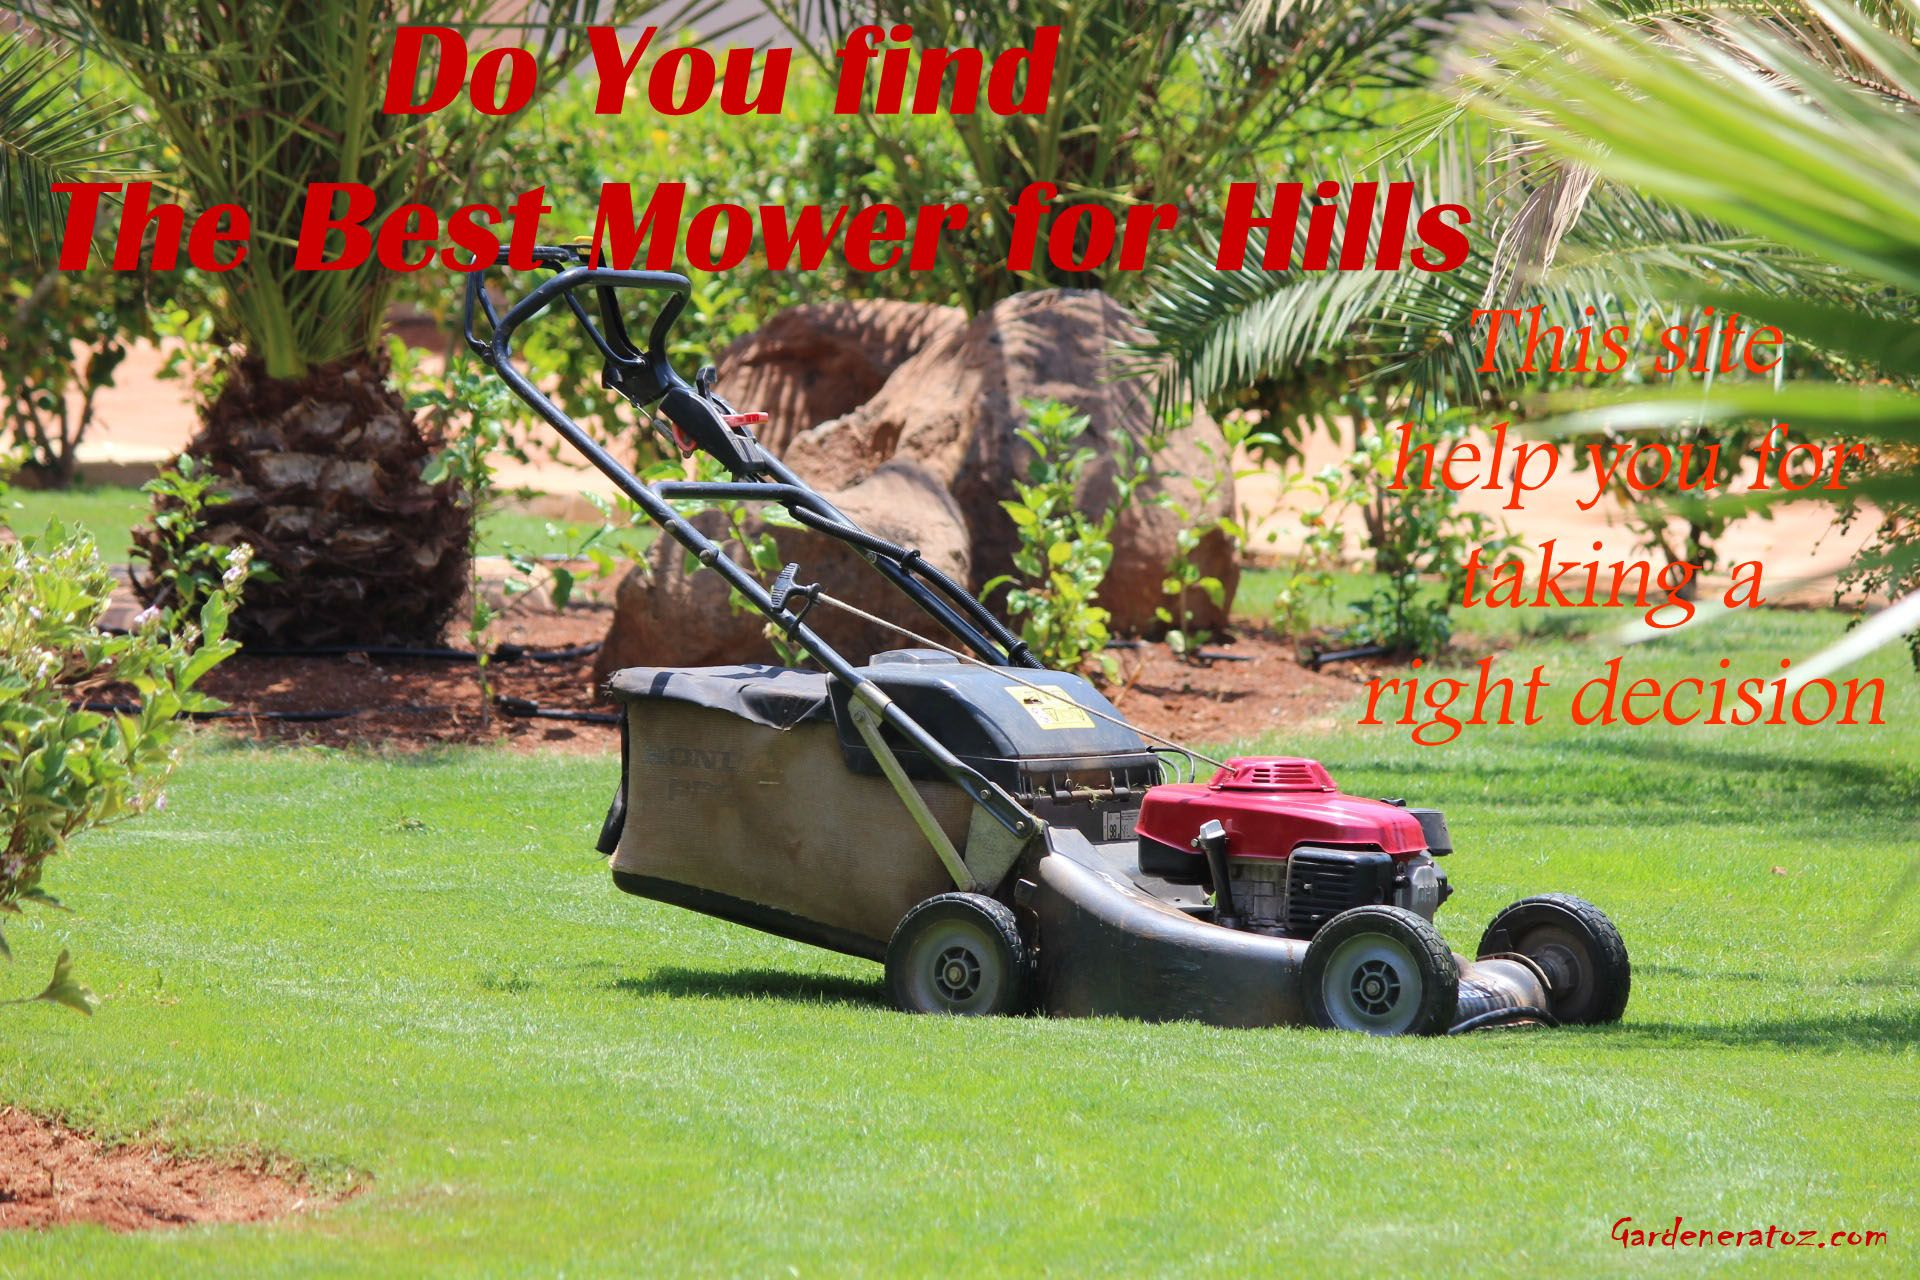 c2bf7511f39a51ad7556d2d9d57bbd5d - Hire The Gardener Snow Removal Reviews